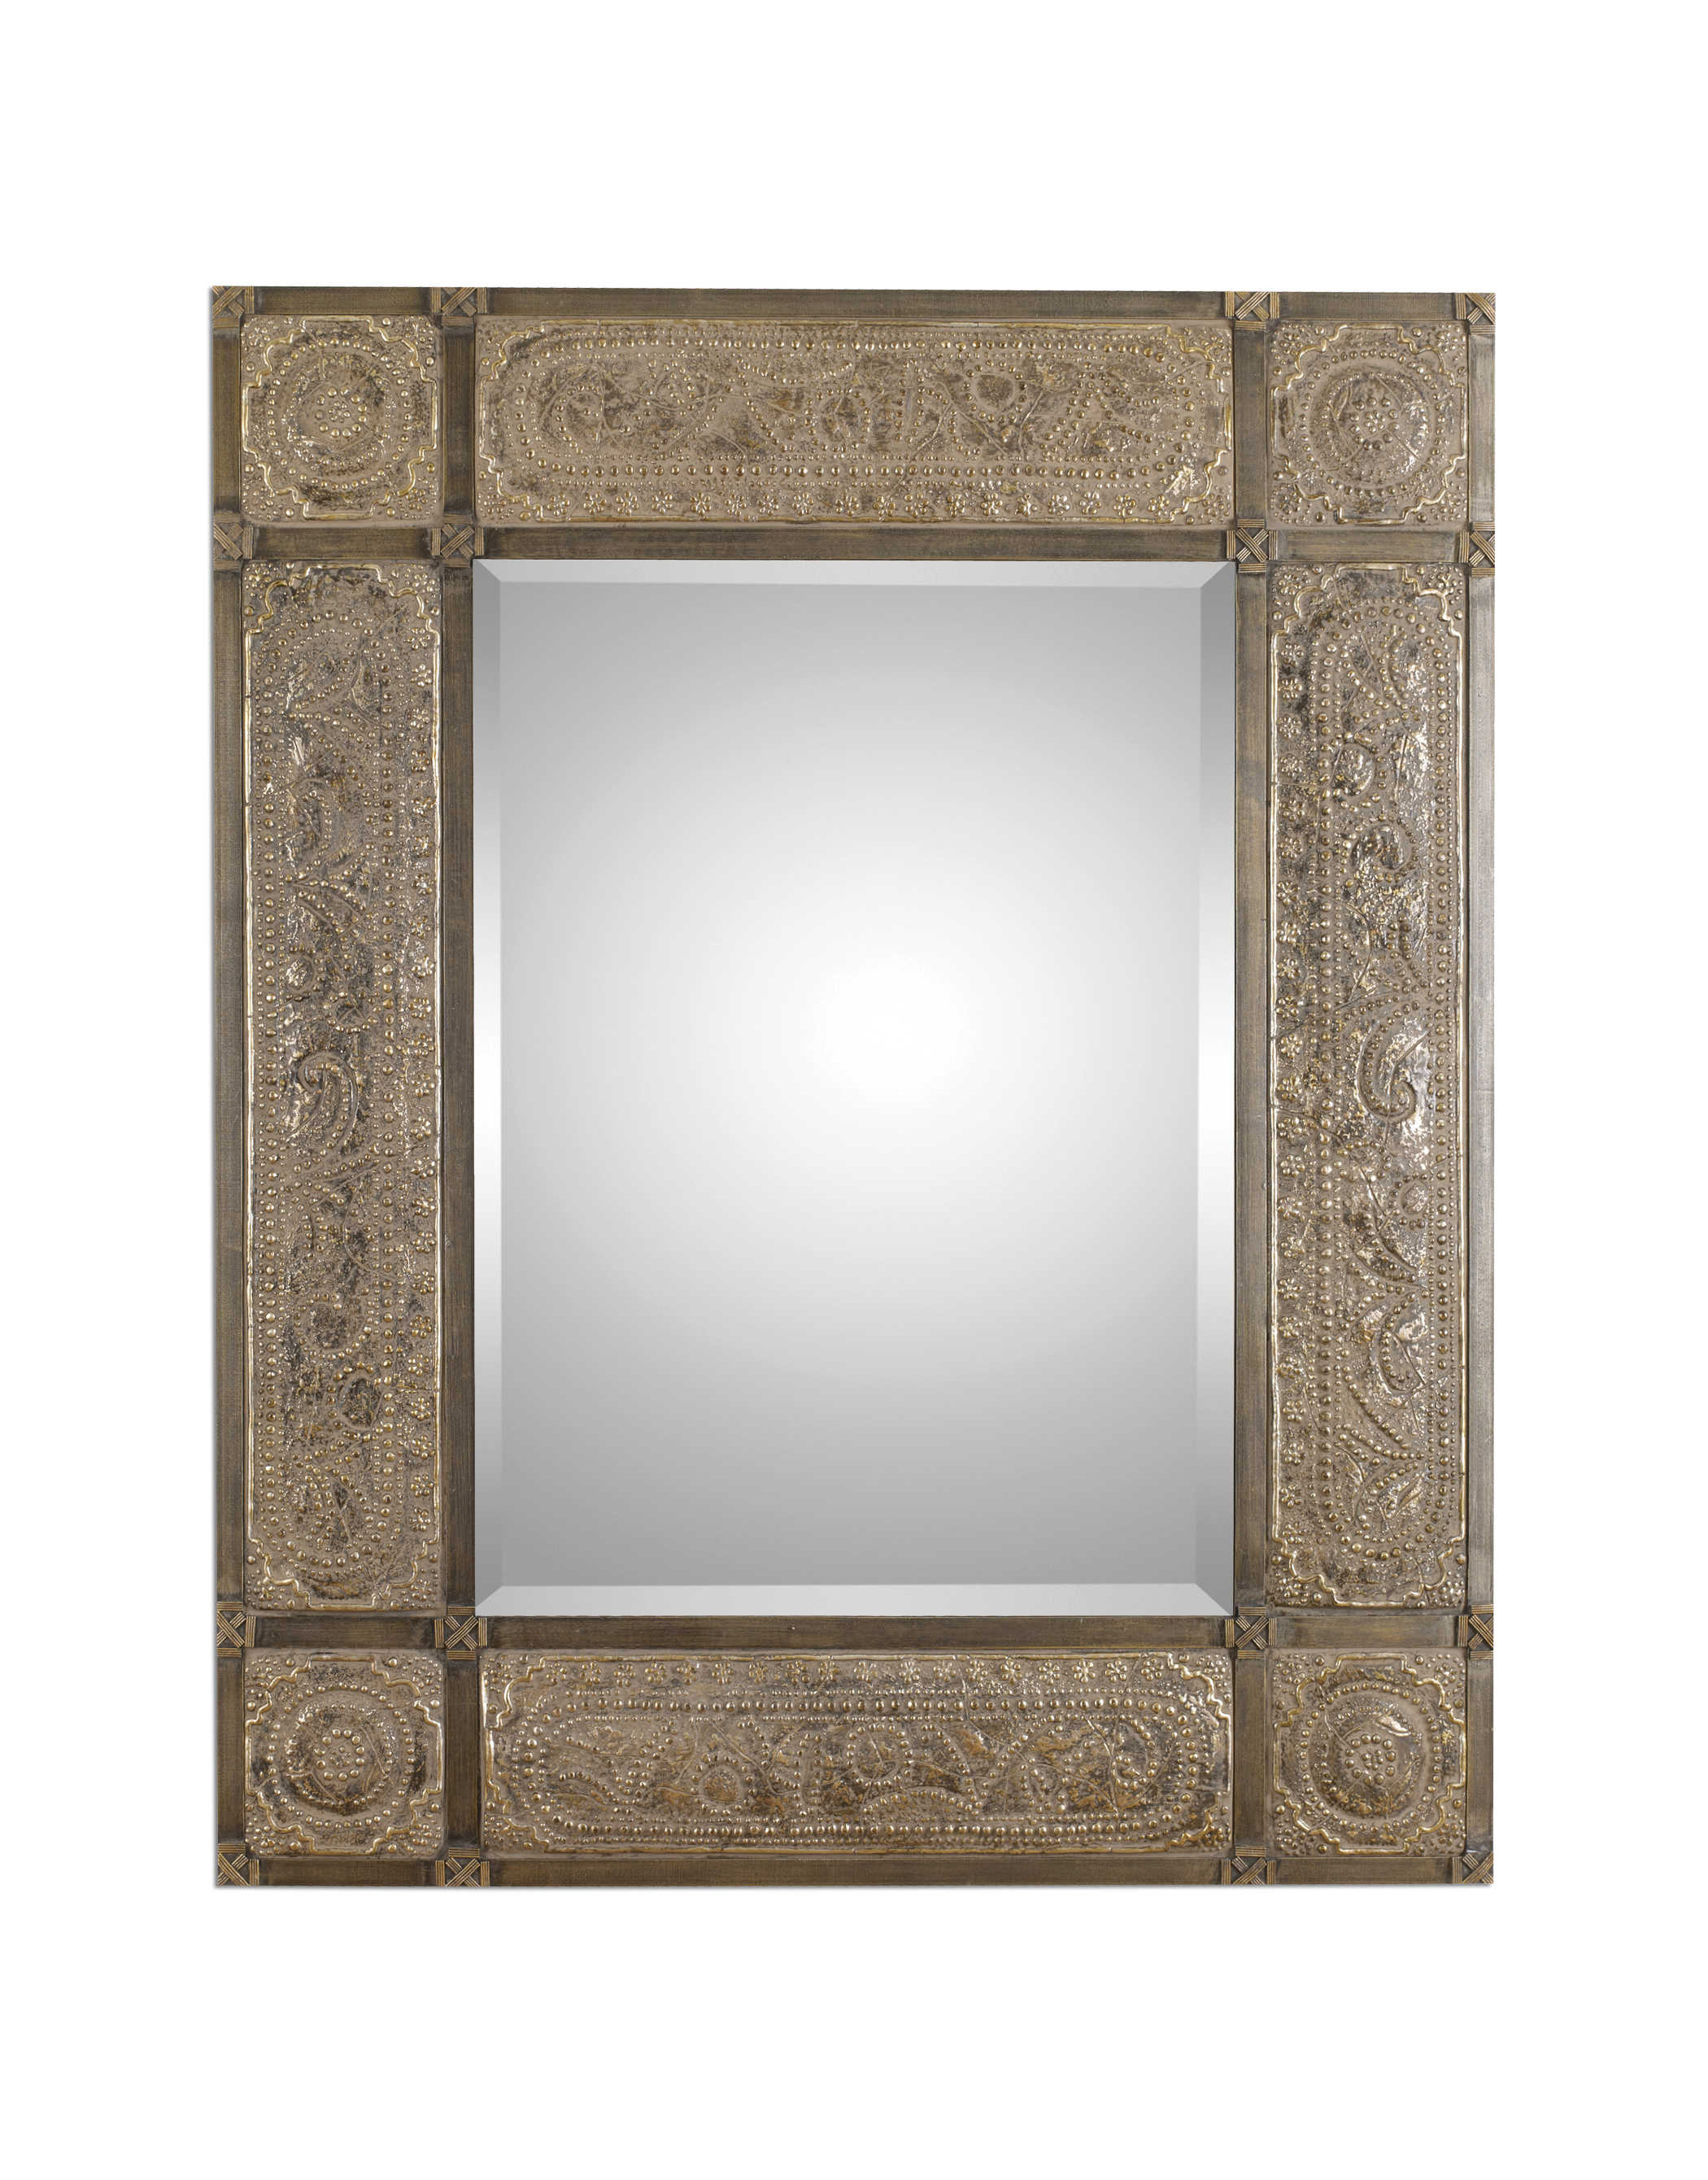 02 3206110 harvest serenity miroir for Miroir 50x60